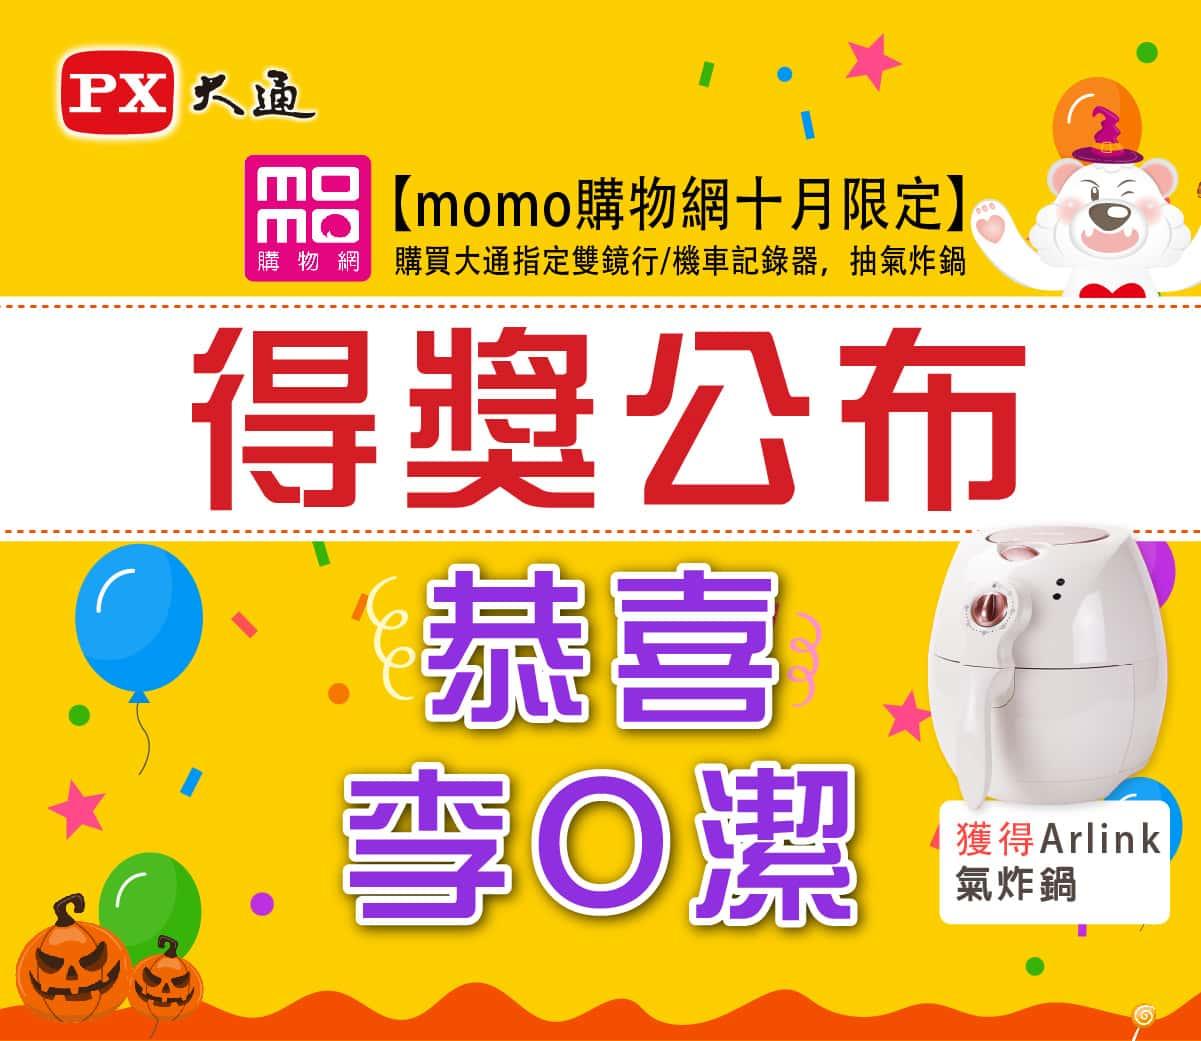 proimages/news/20190917-momo-at10-雙鏡送喇叭抽氣炸鍋-放官網_工作區域_1_複本_11.jpg